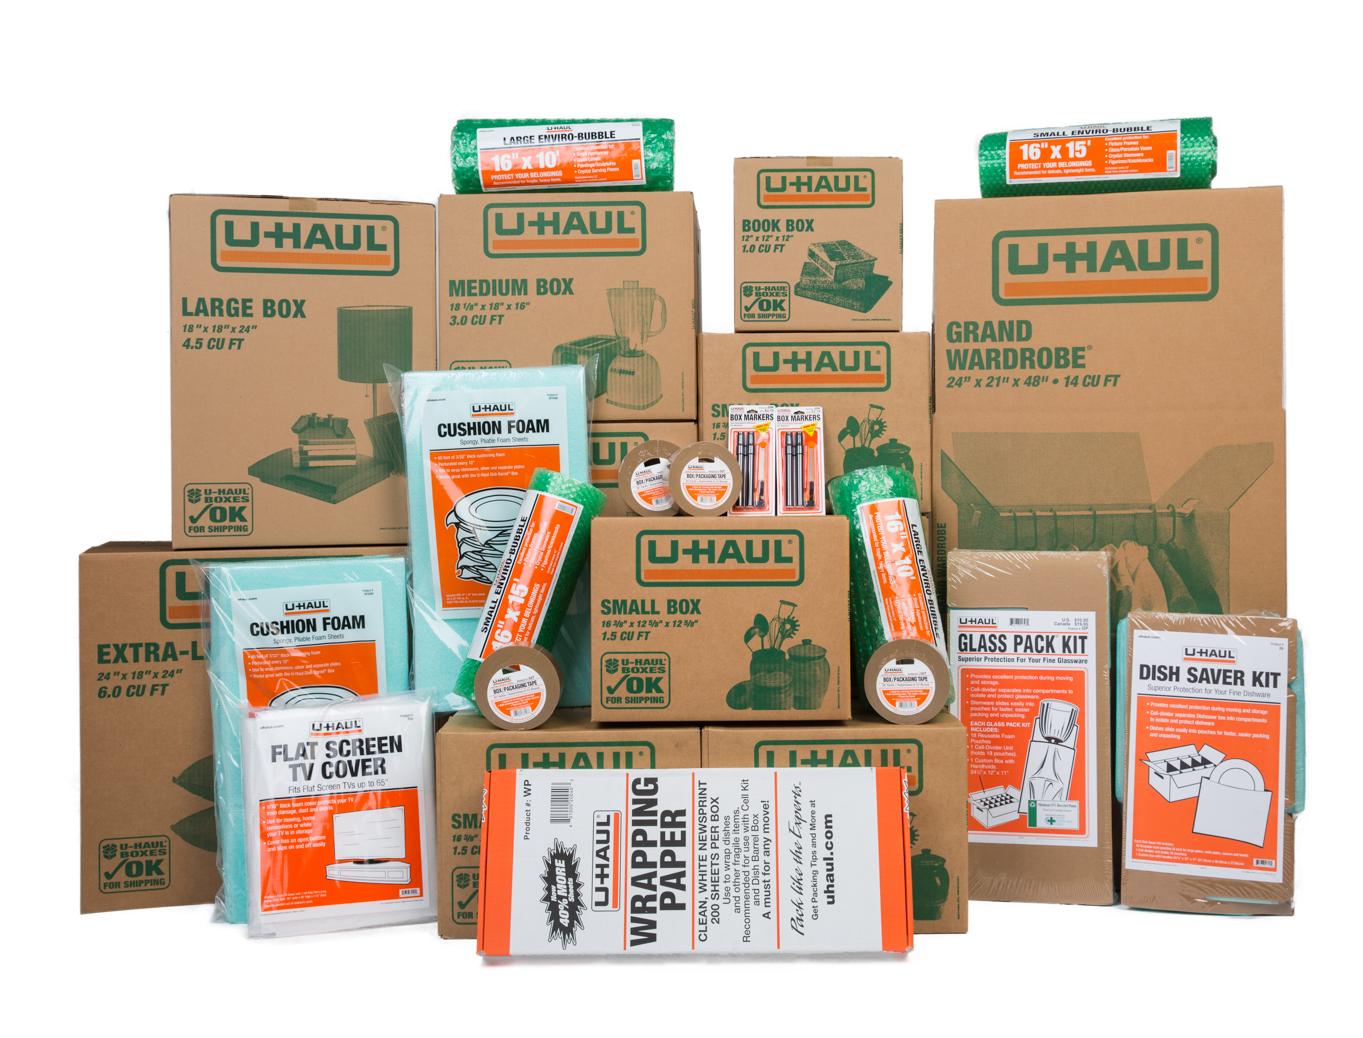 Grand kit d'emballage